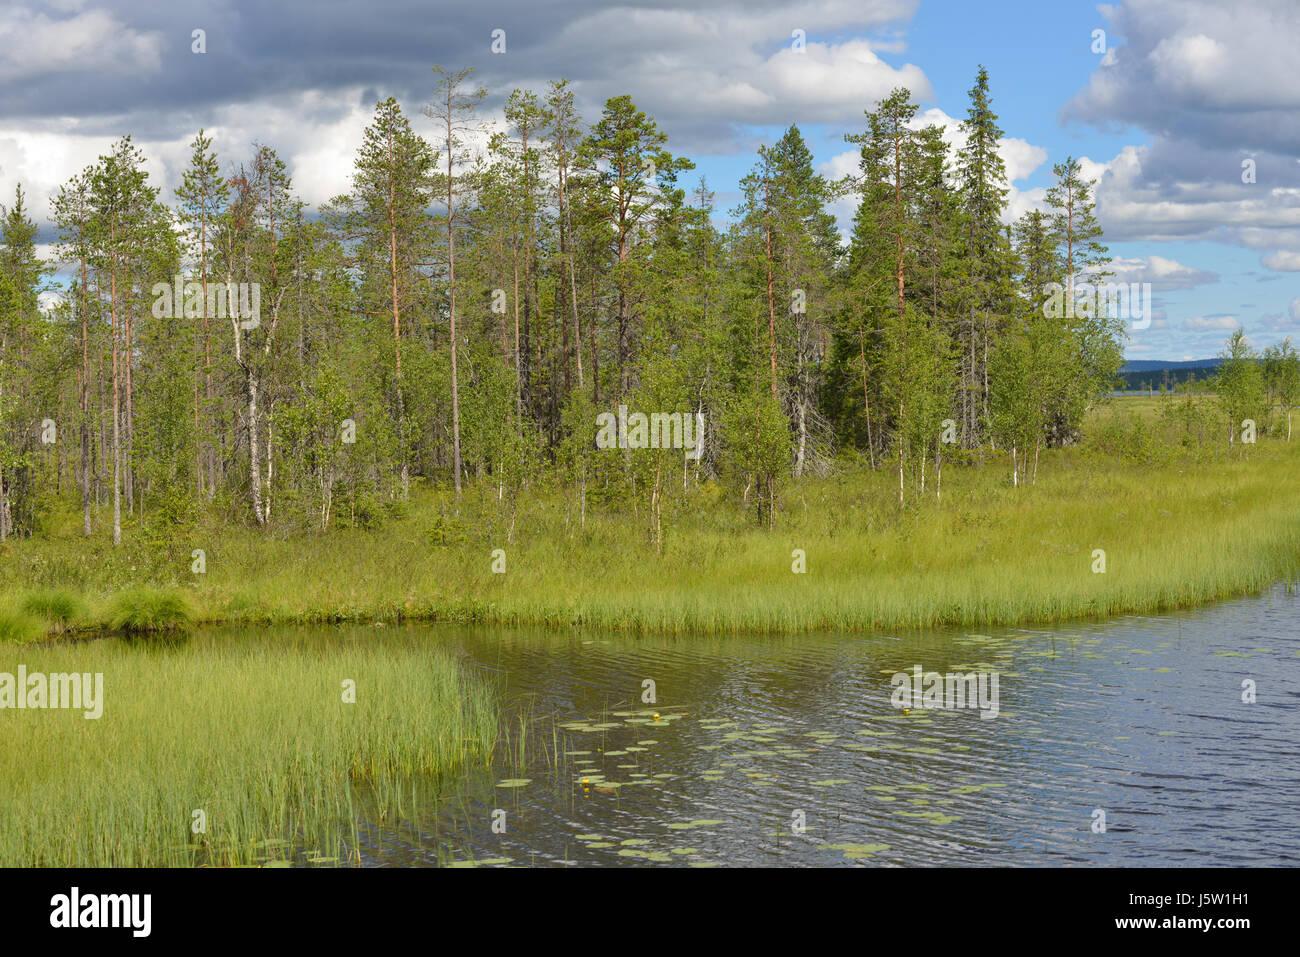 Northern landscape. Marshy shore. Finnish Lapland - Stock Image